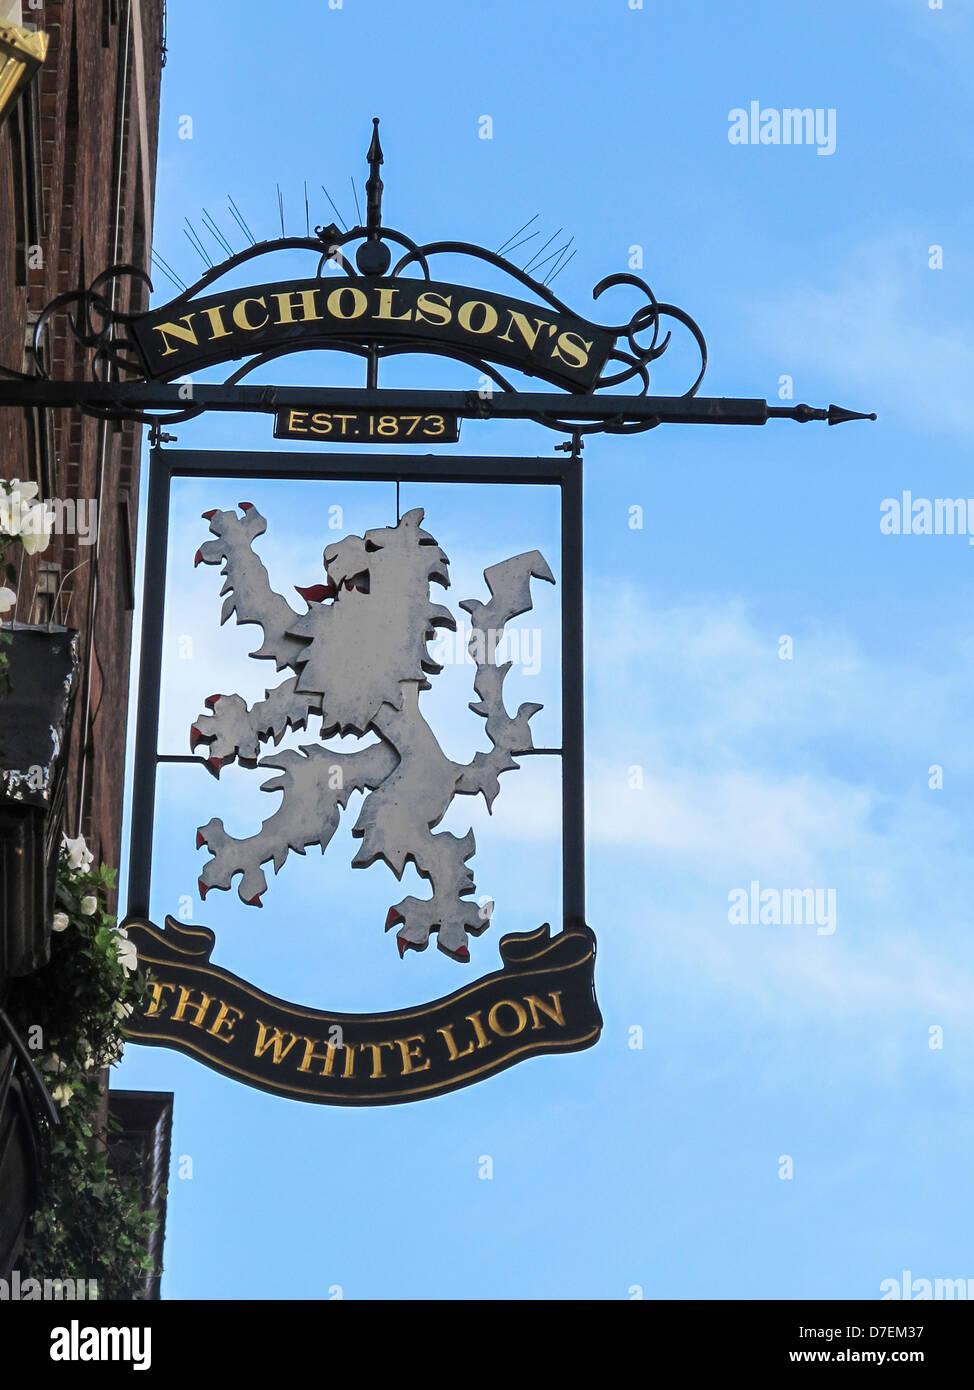 The White Lion - pub sign against a blue sky, Covent Garden, London - Stock Image